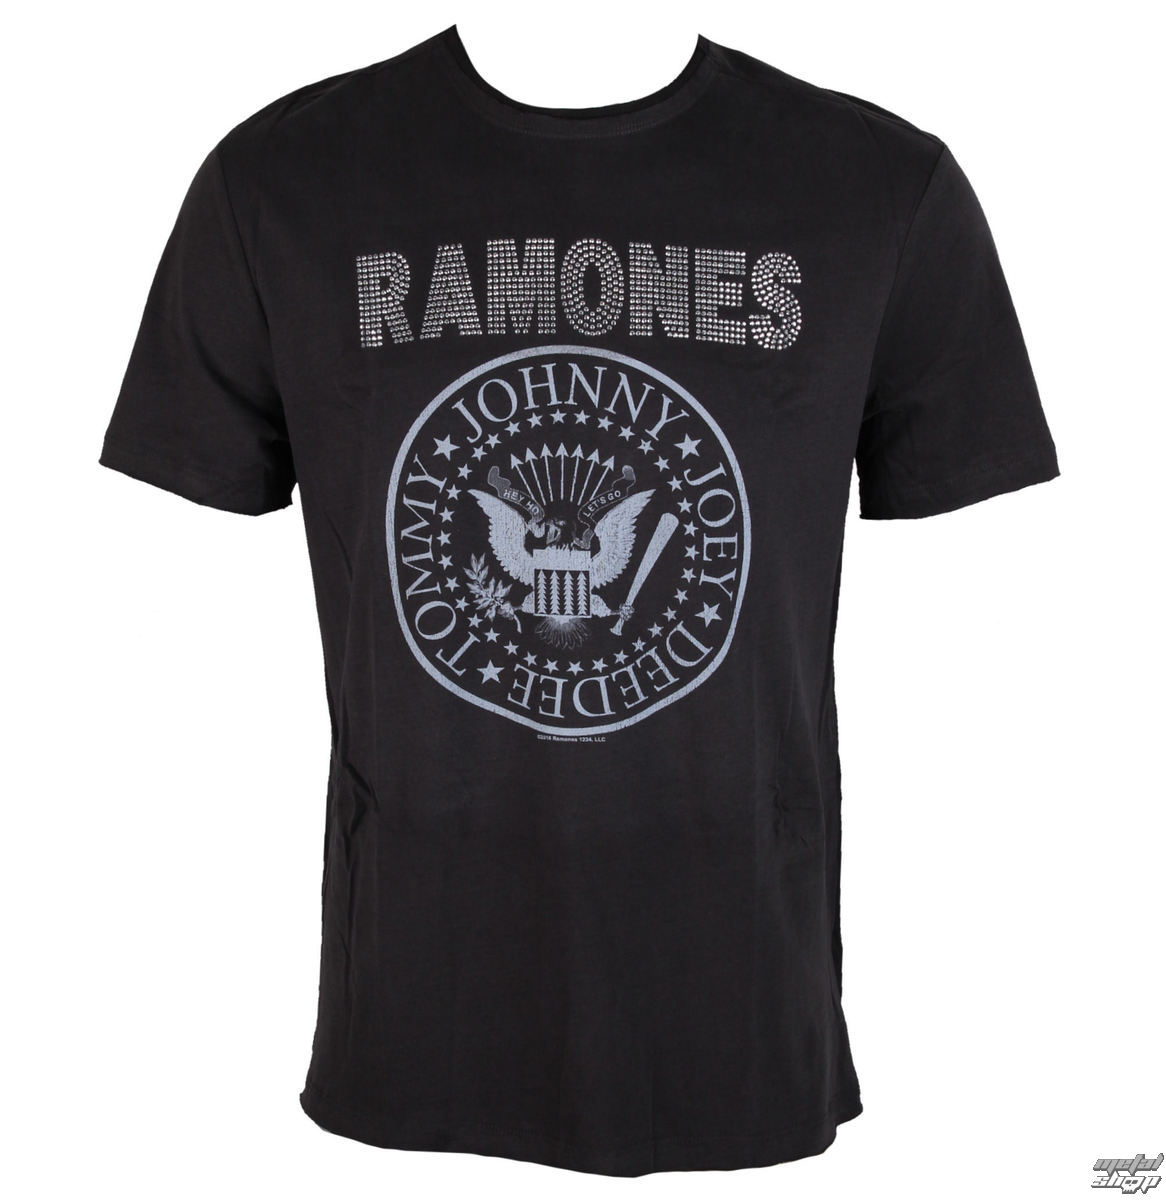 metál póló férfi Ramones - LOGO - AMPLIFIED - AV210RLS - Metalshop.hu 6ad6c70aaf